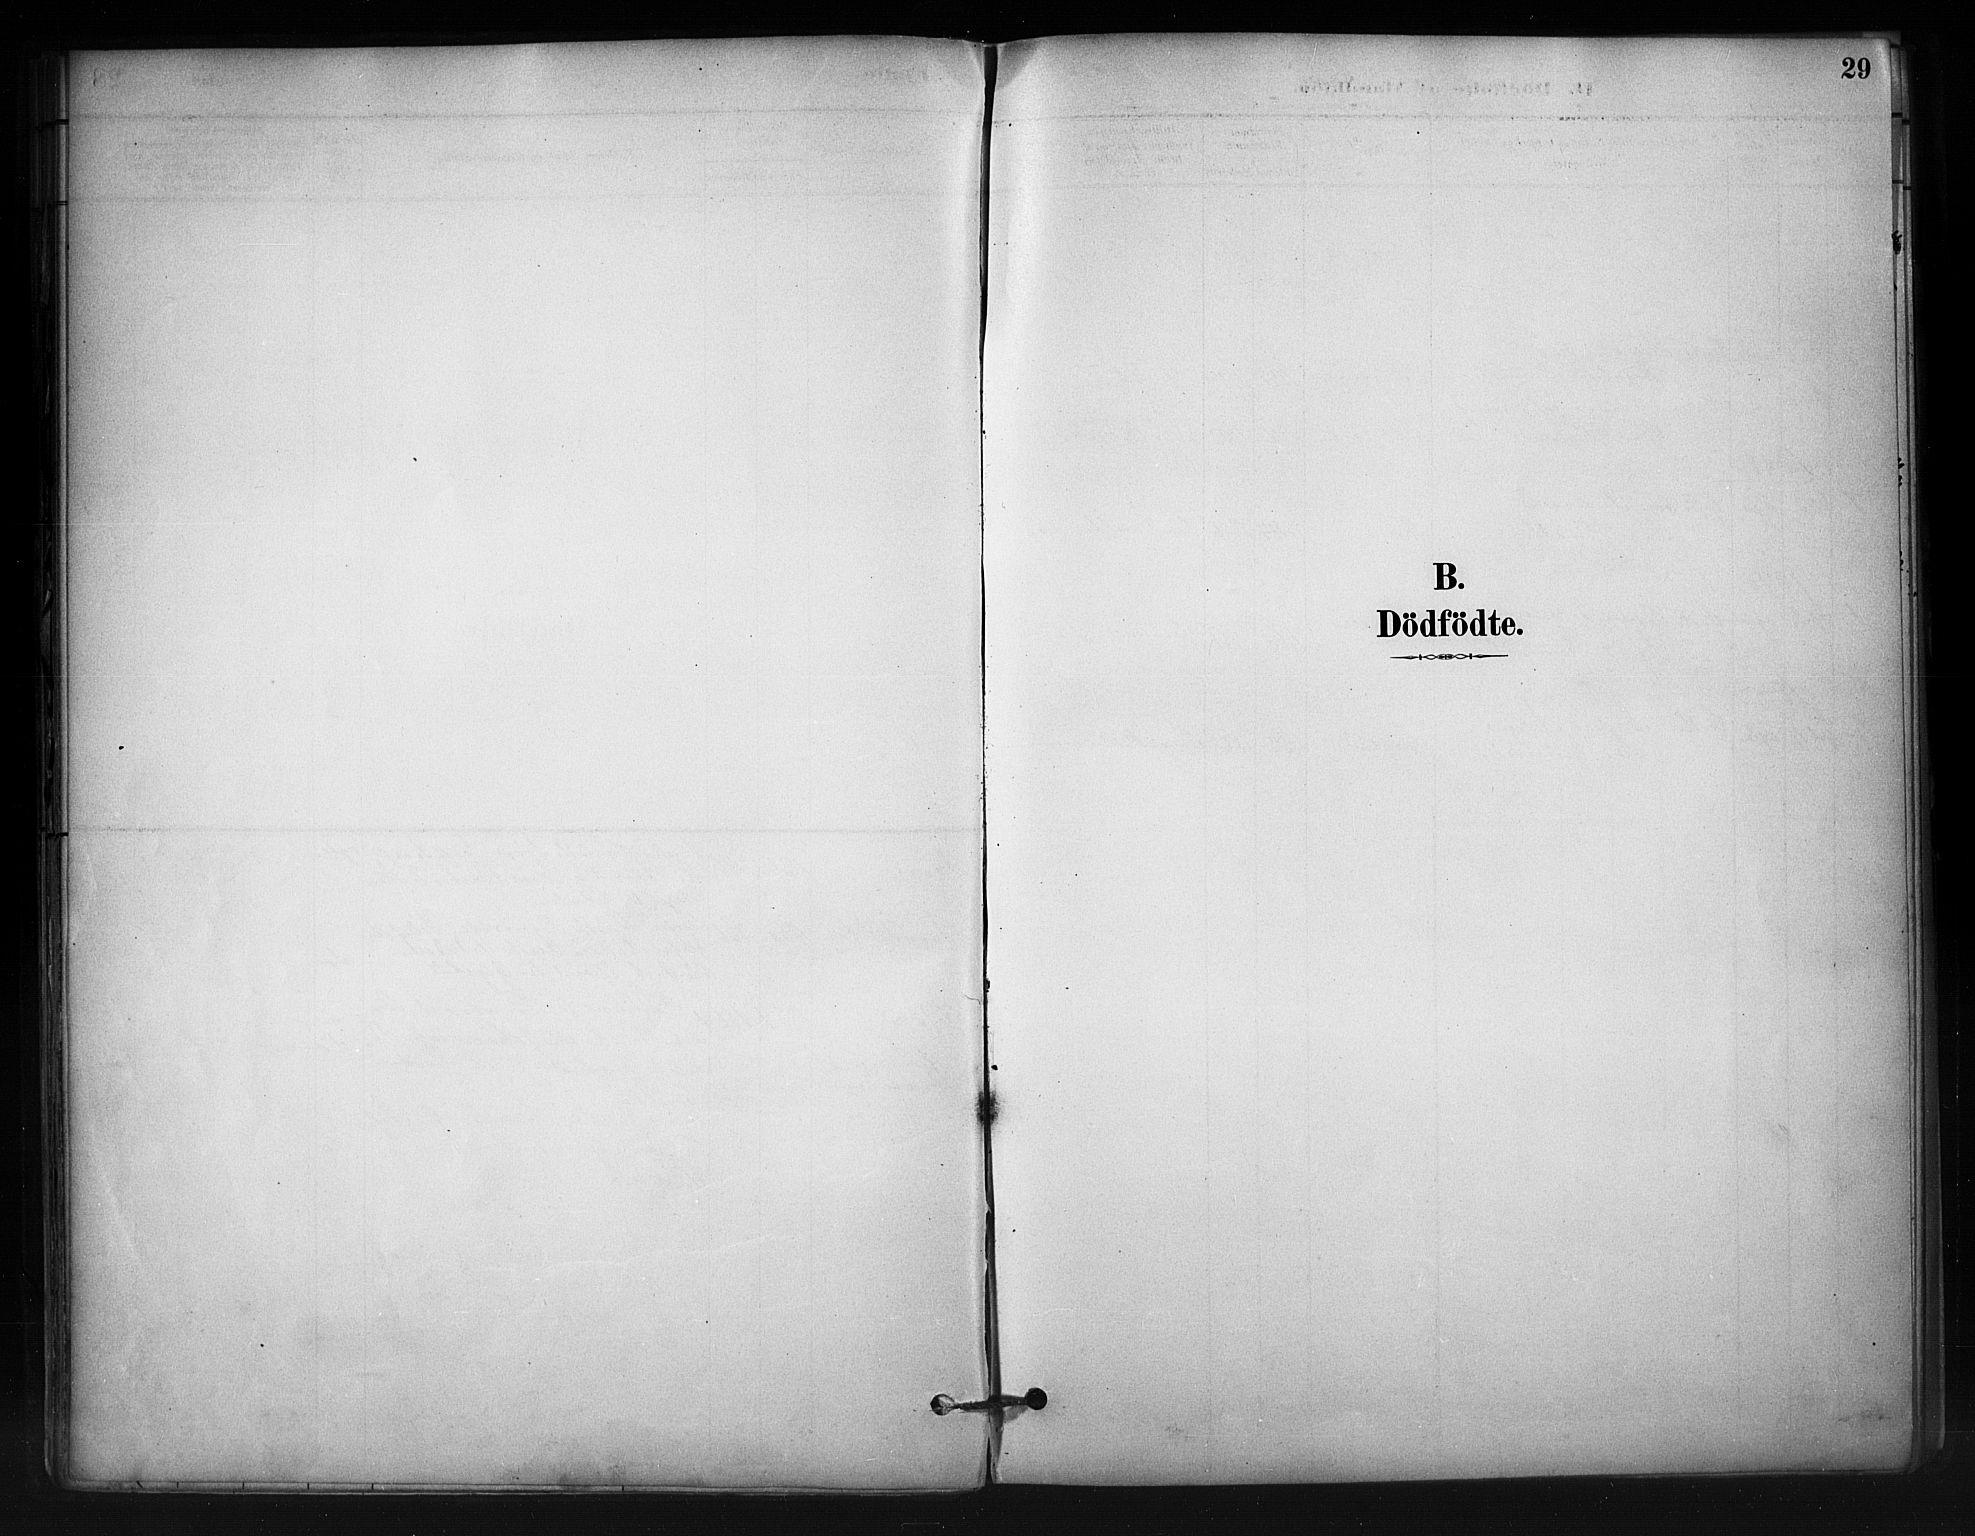 SAH, Nord-Aurdal prestekontor, Ministerialbok nr. 12, 1883-1895, s. 29